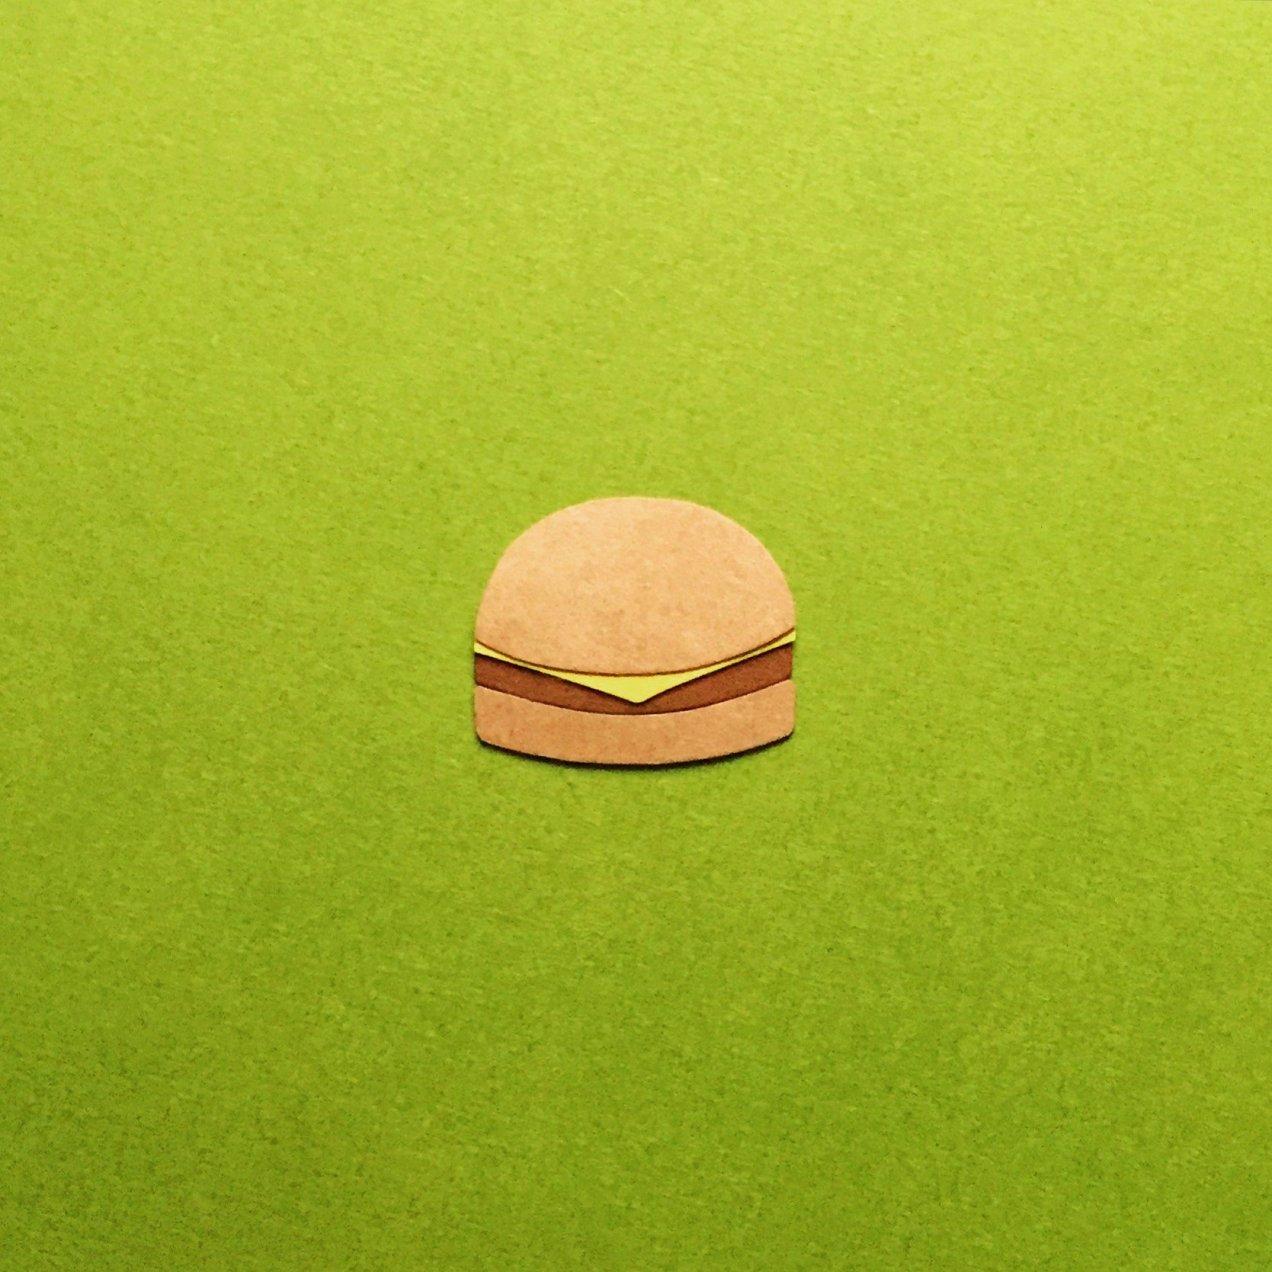 Paper emoji - burger